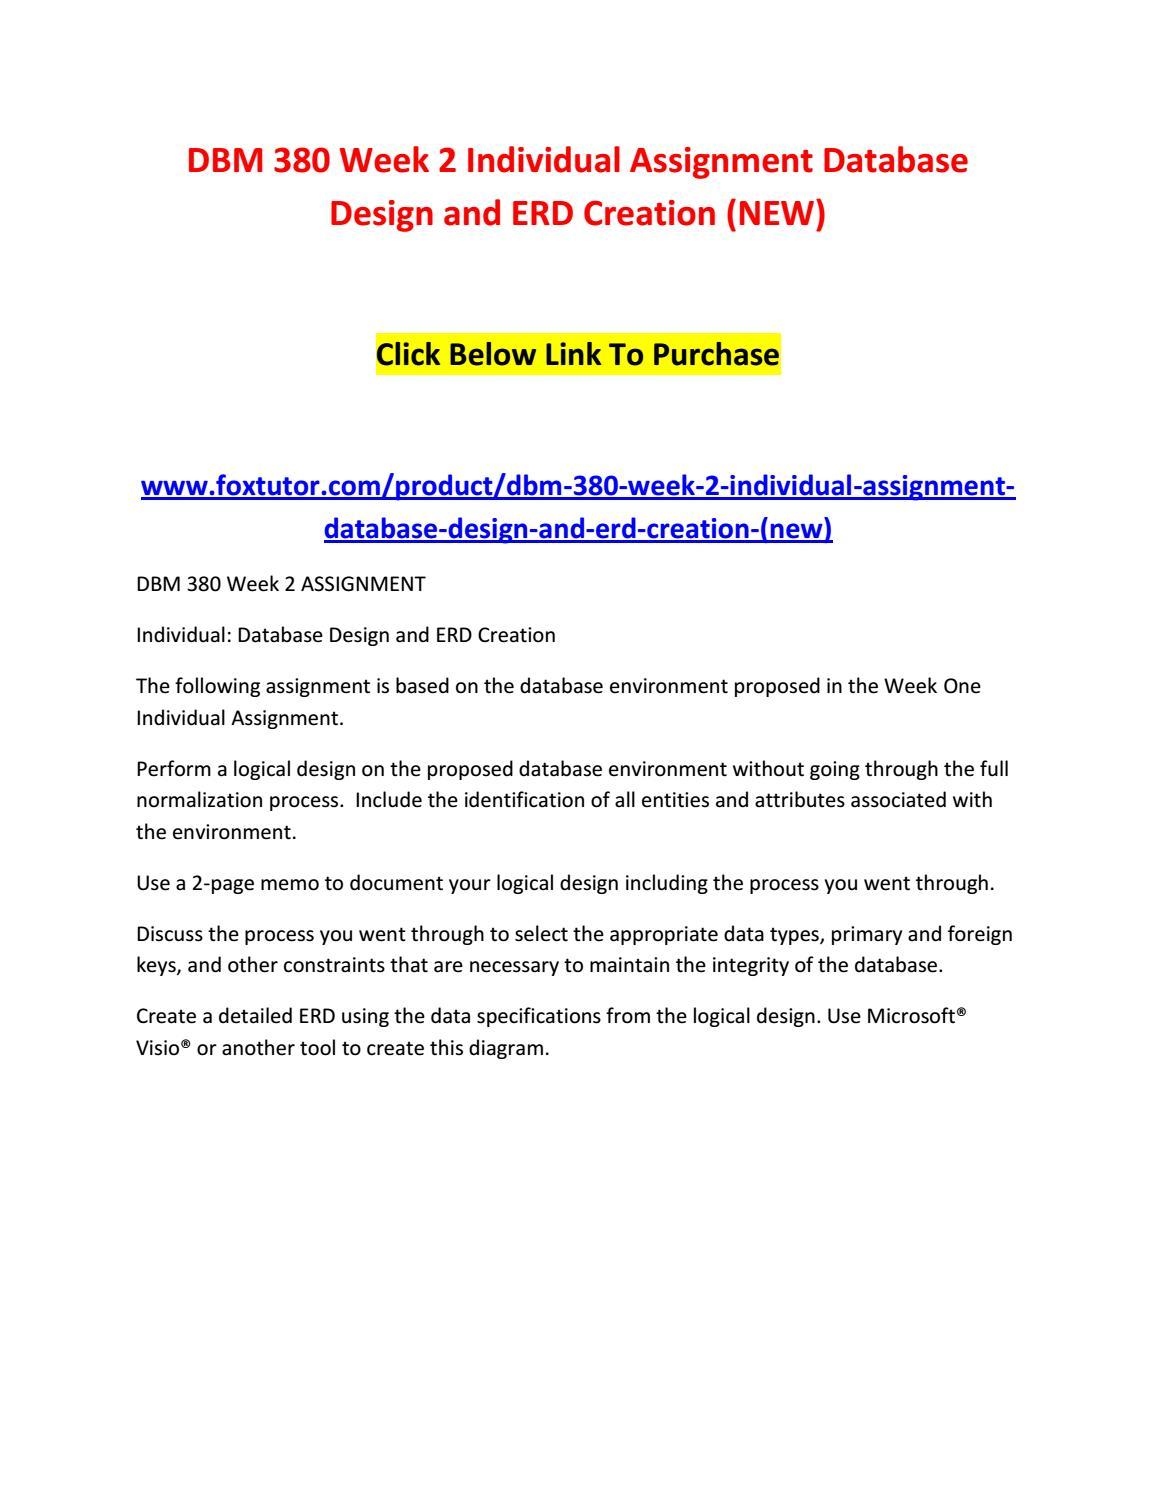 Dbm 380 Week 2 Individual Assignment Database Design And Erd for Database Design And Erd Creation